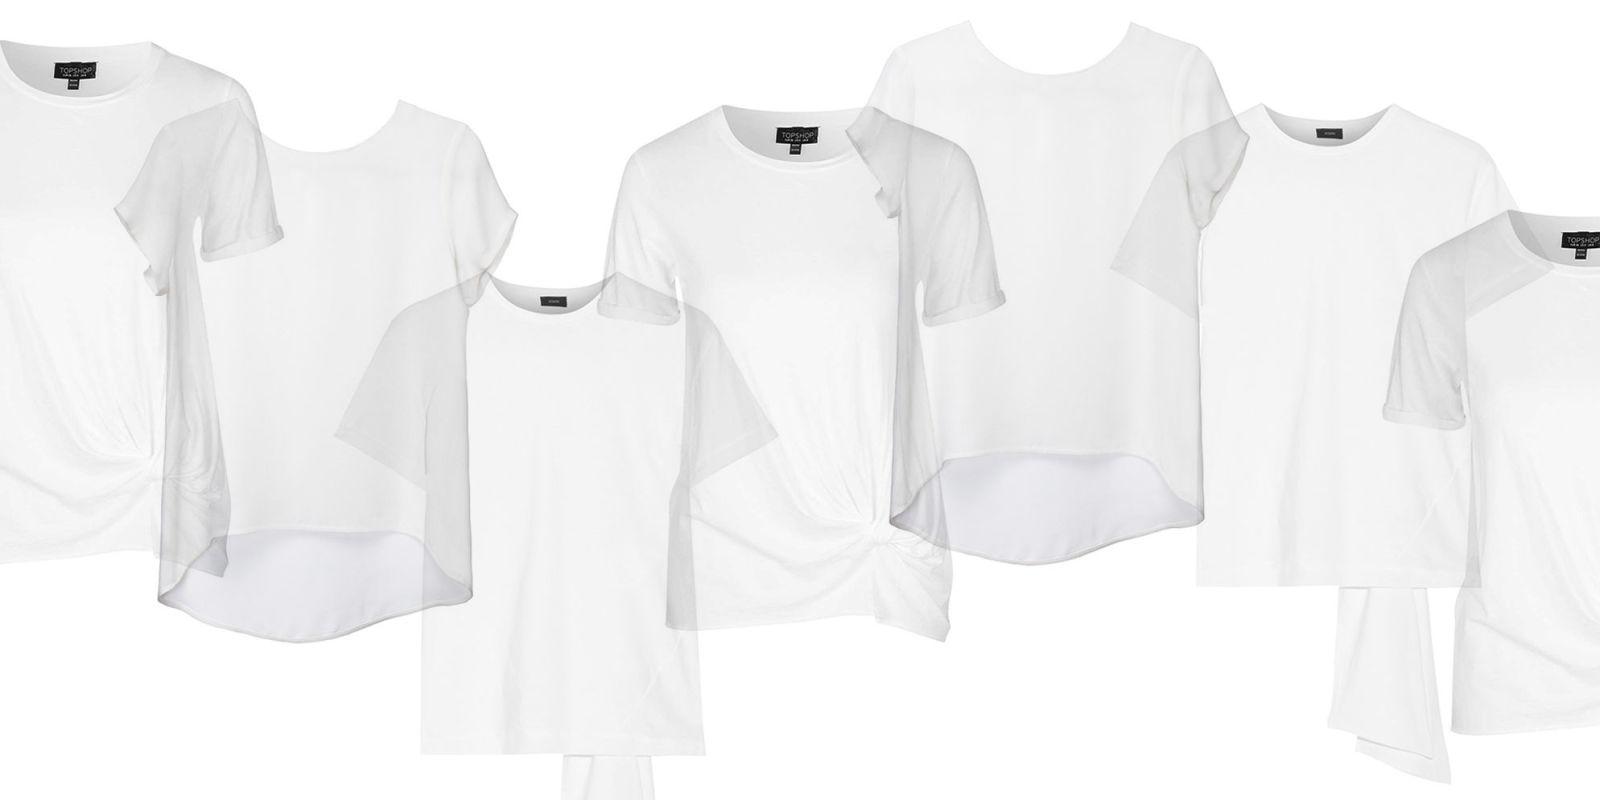 10 best white t shirts for women 2018 white t shirts for The best plain white t shirts